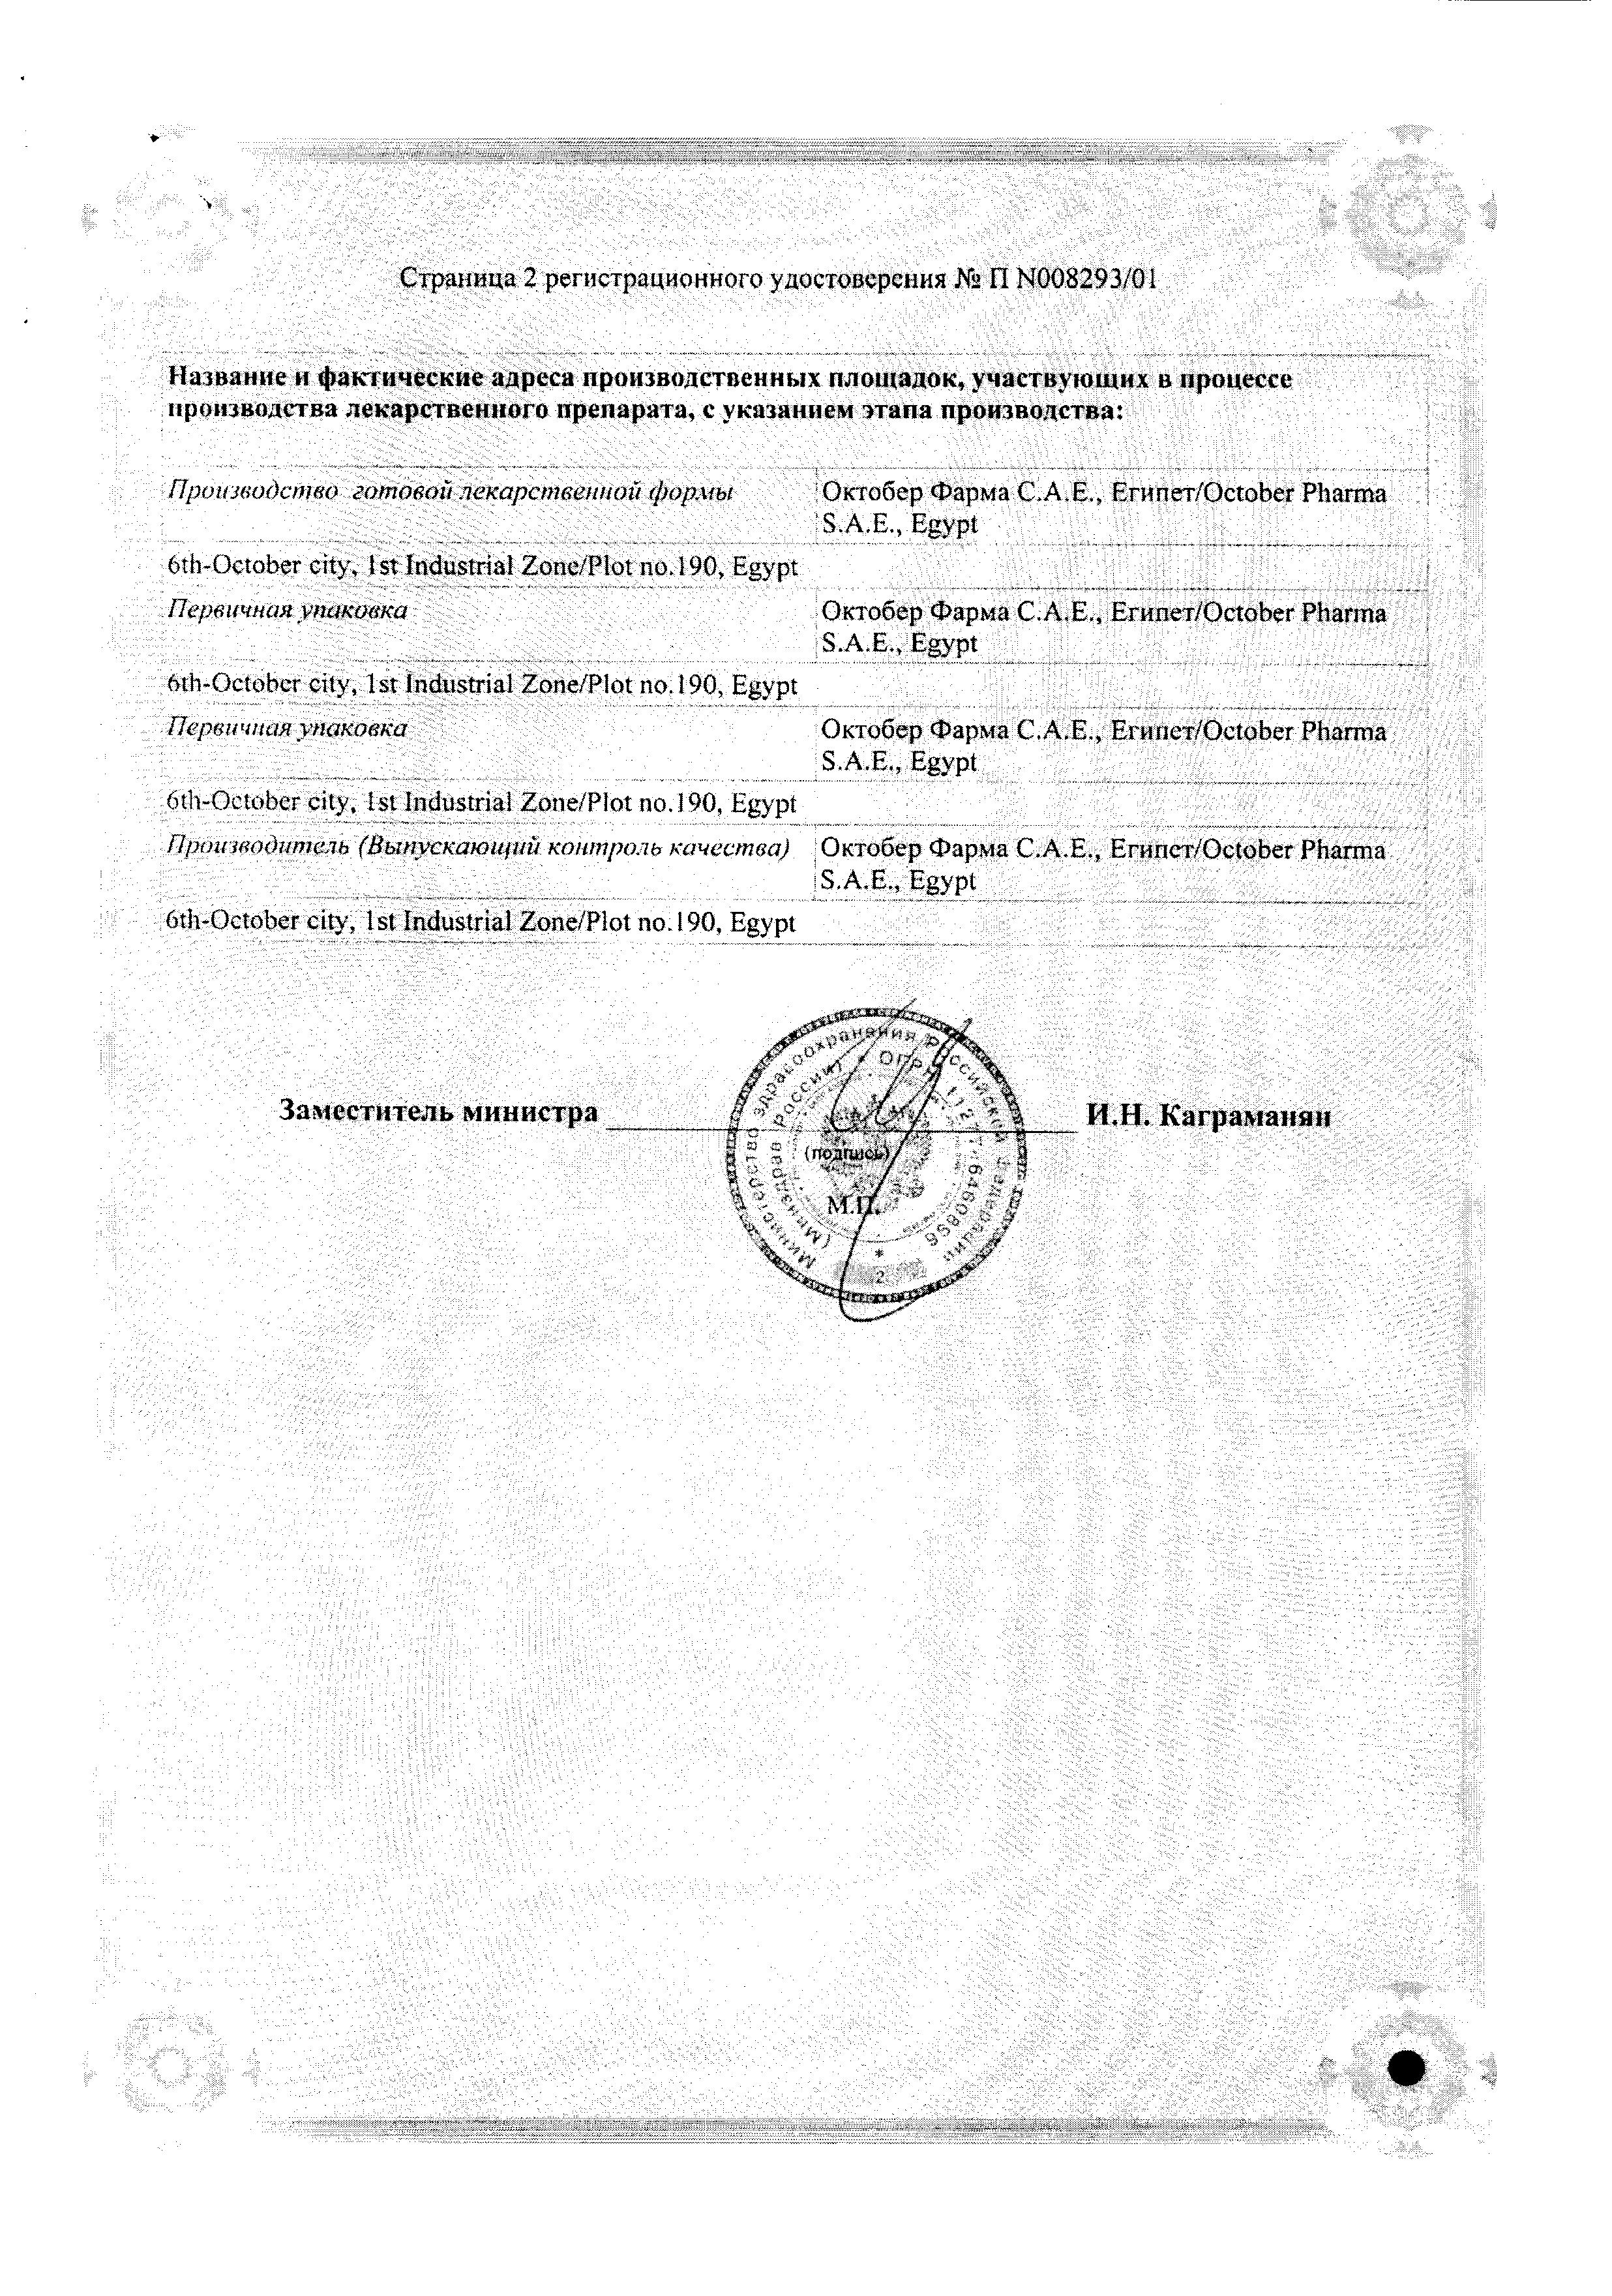 Ларипронт сертификат